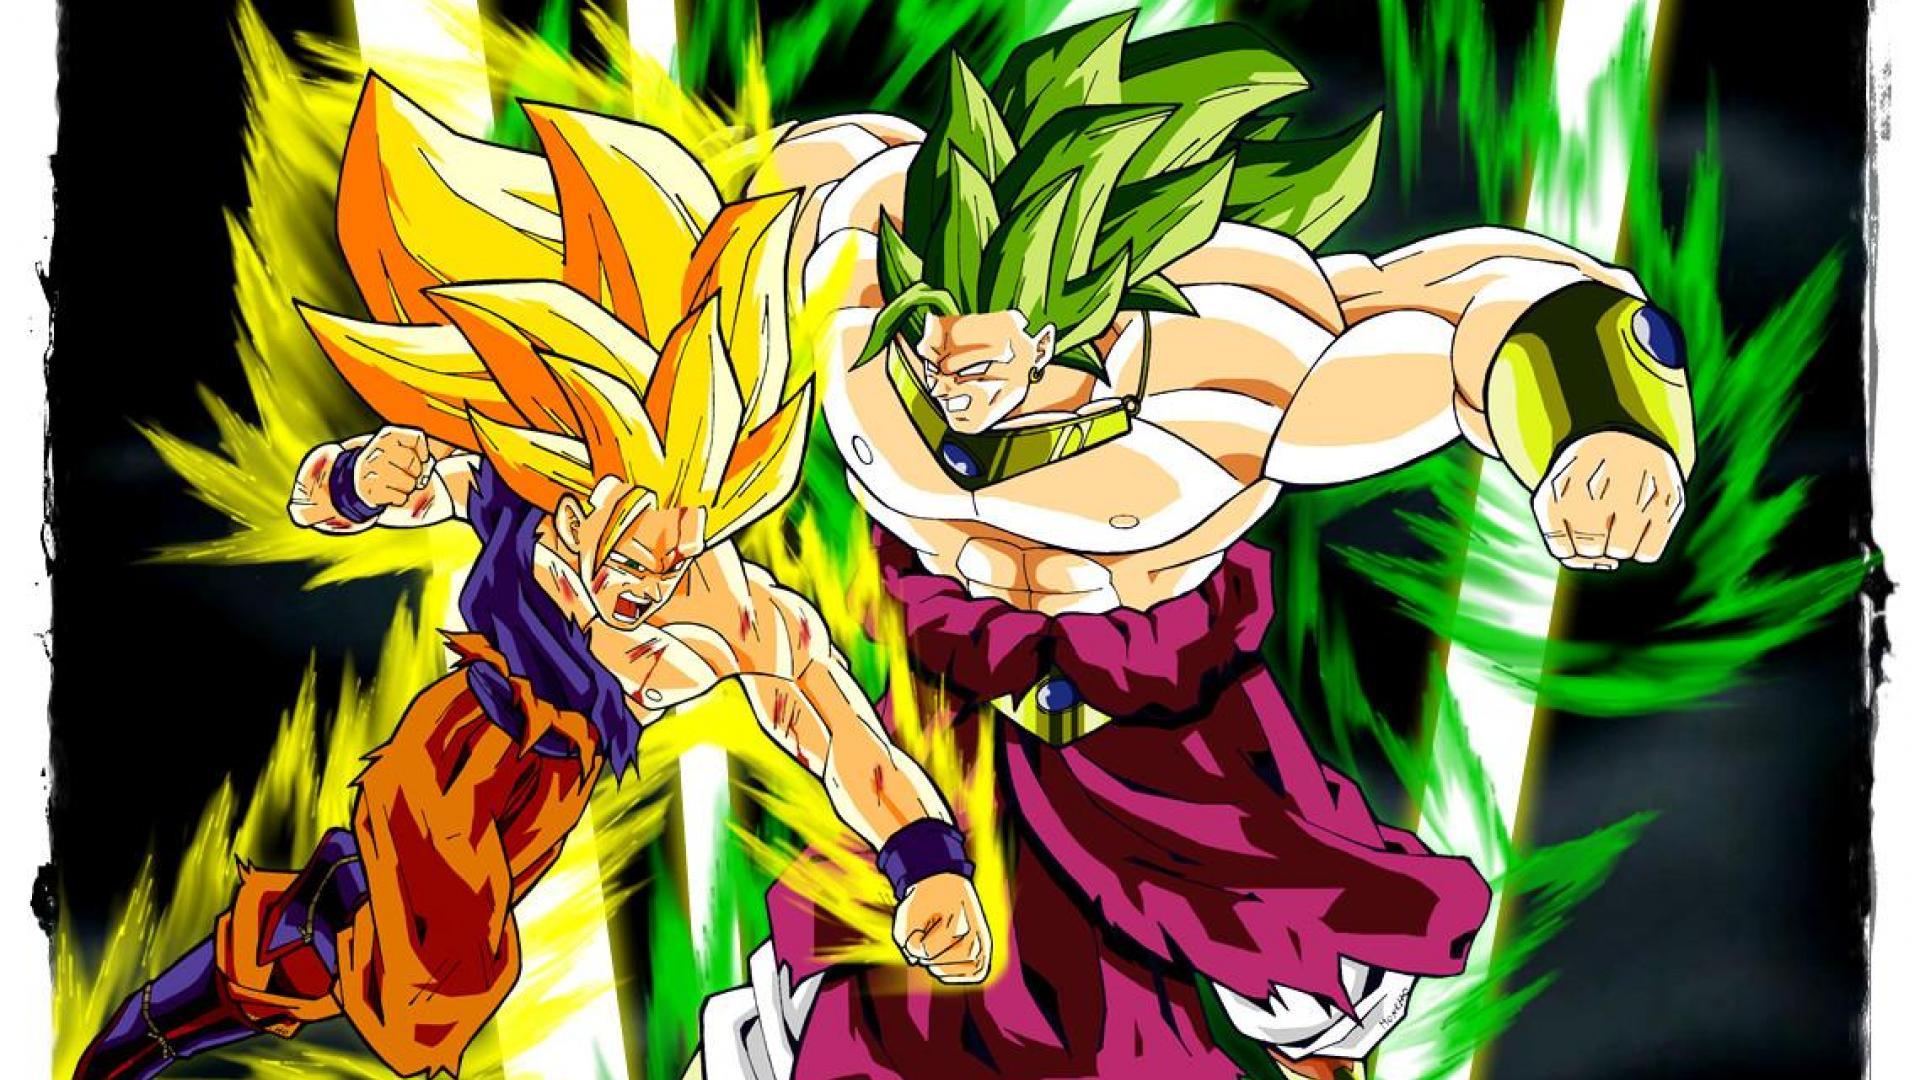 Goku Vs Broly Wallpapers High Resolution Backgrounds